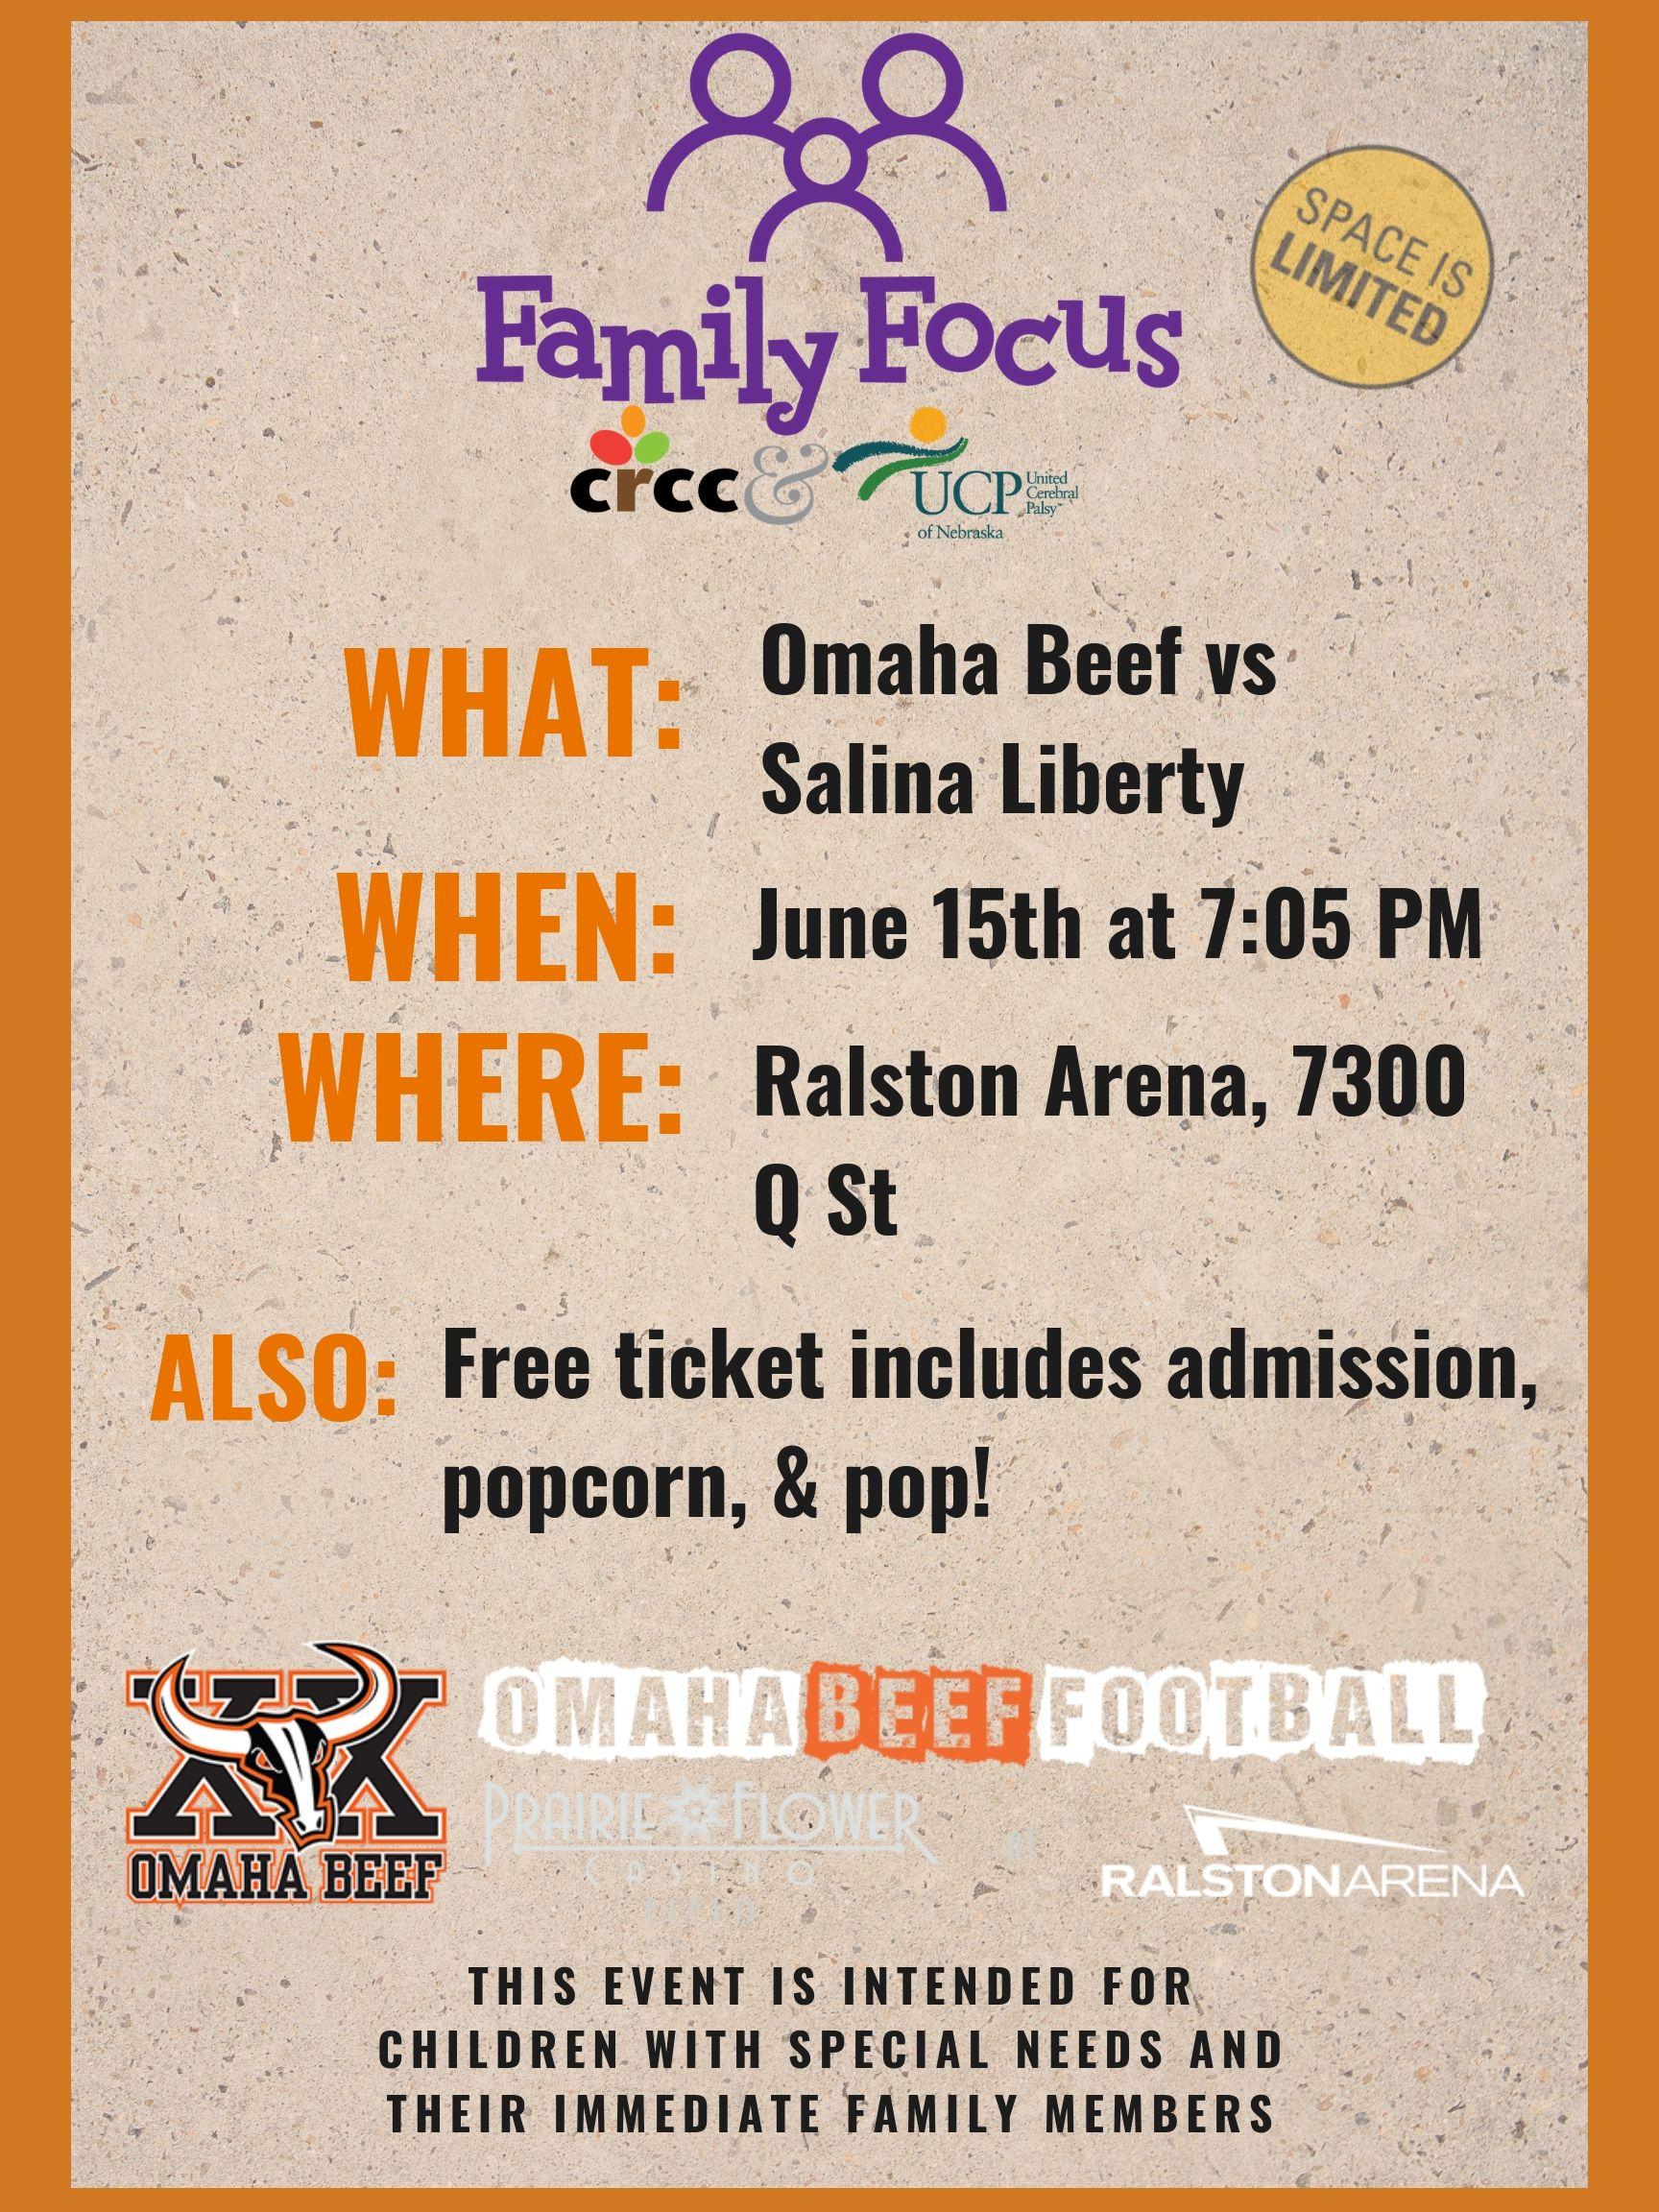 Family Focus: Omaha Beef